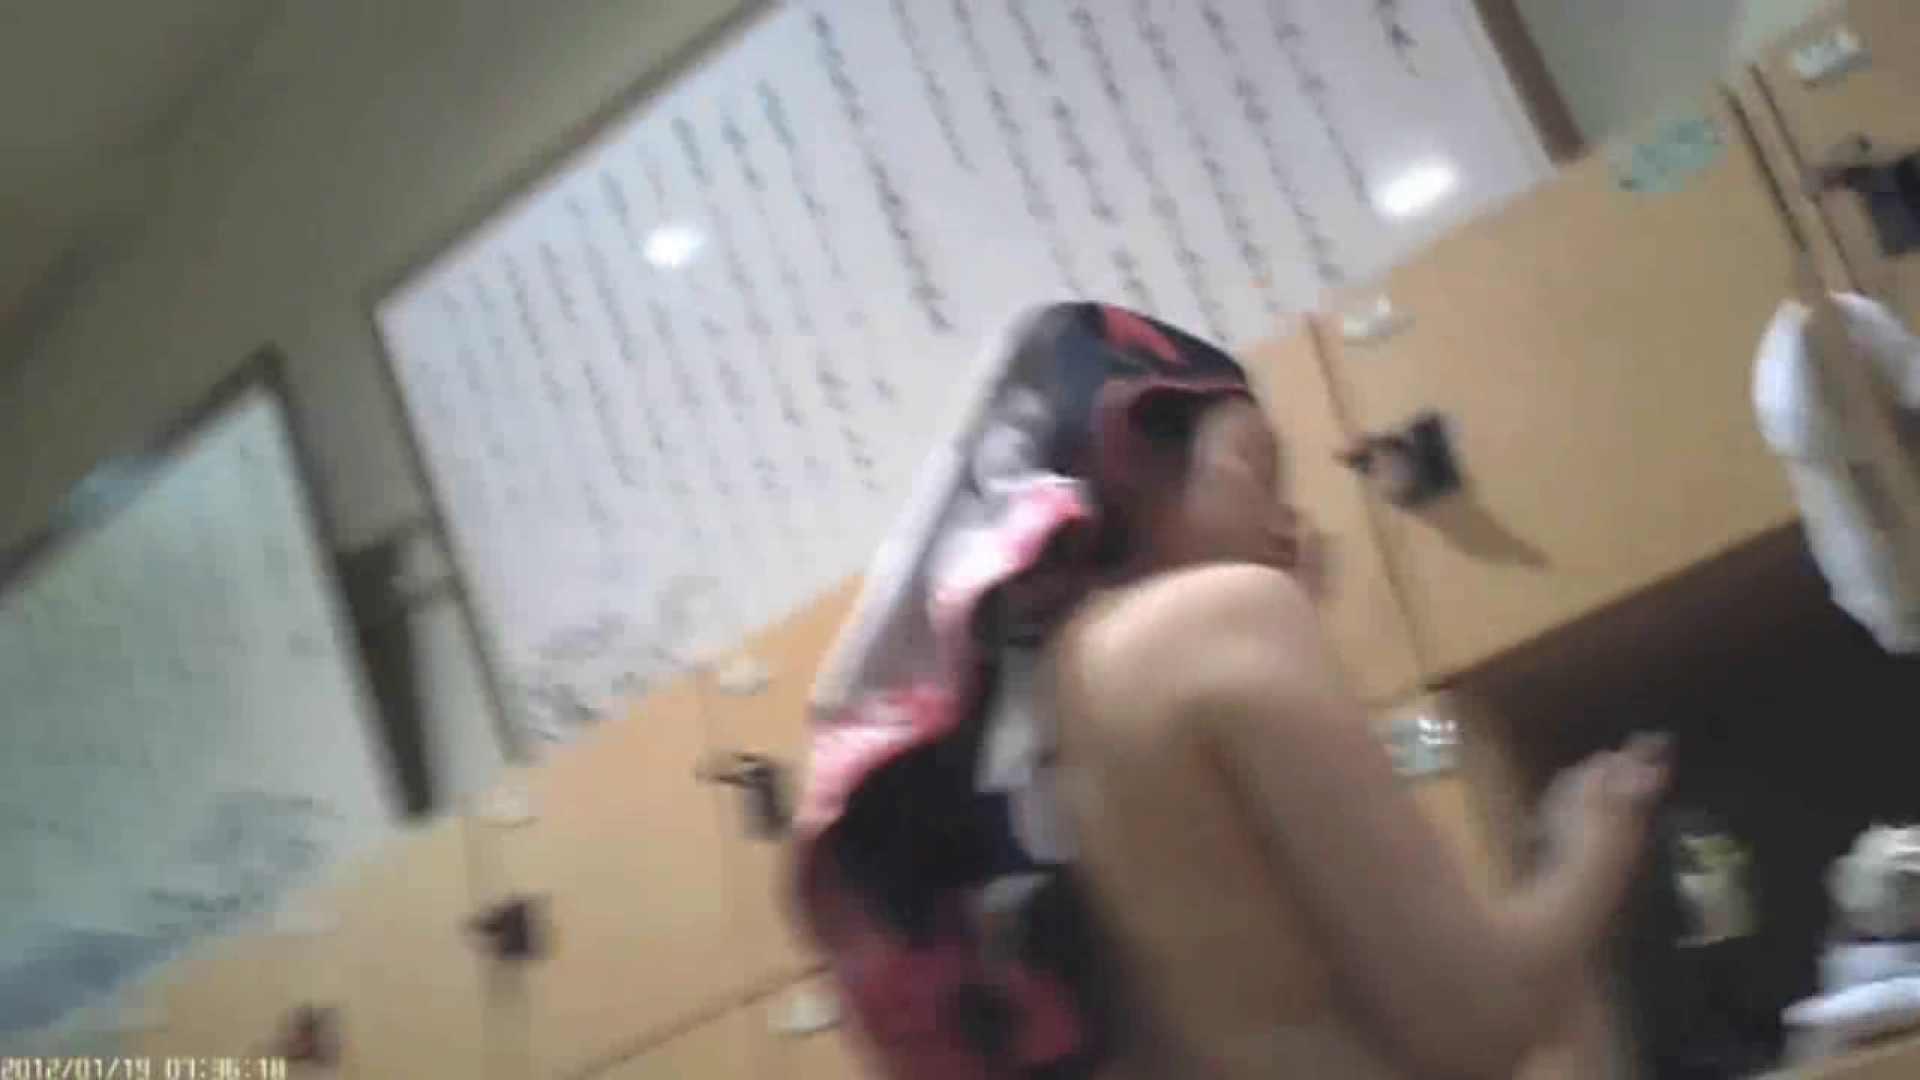 現役ギャル盗撮師 hana様の女風呂潜入撮!Vol.1 銭湯 SEX無修正画像 92pic 48